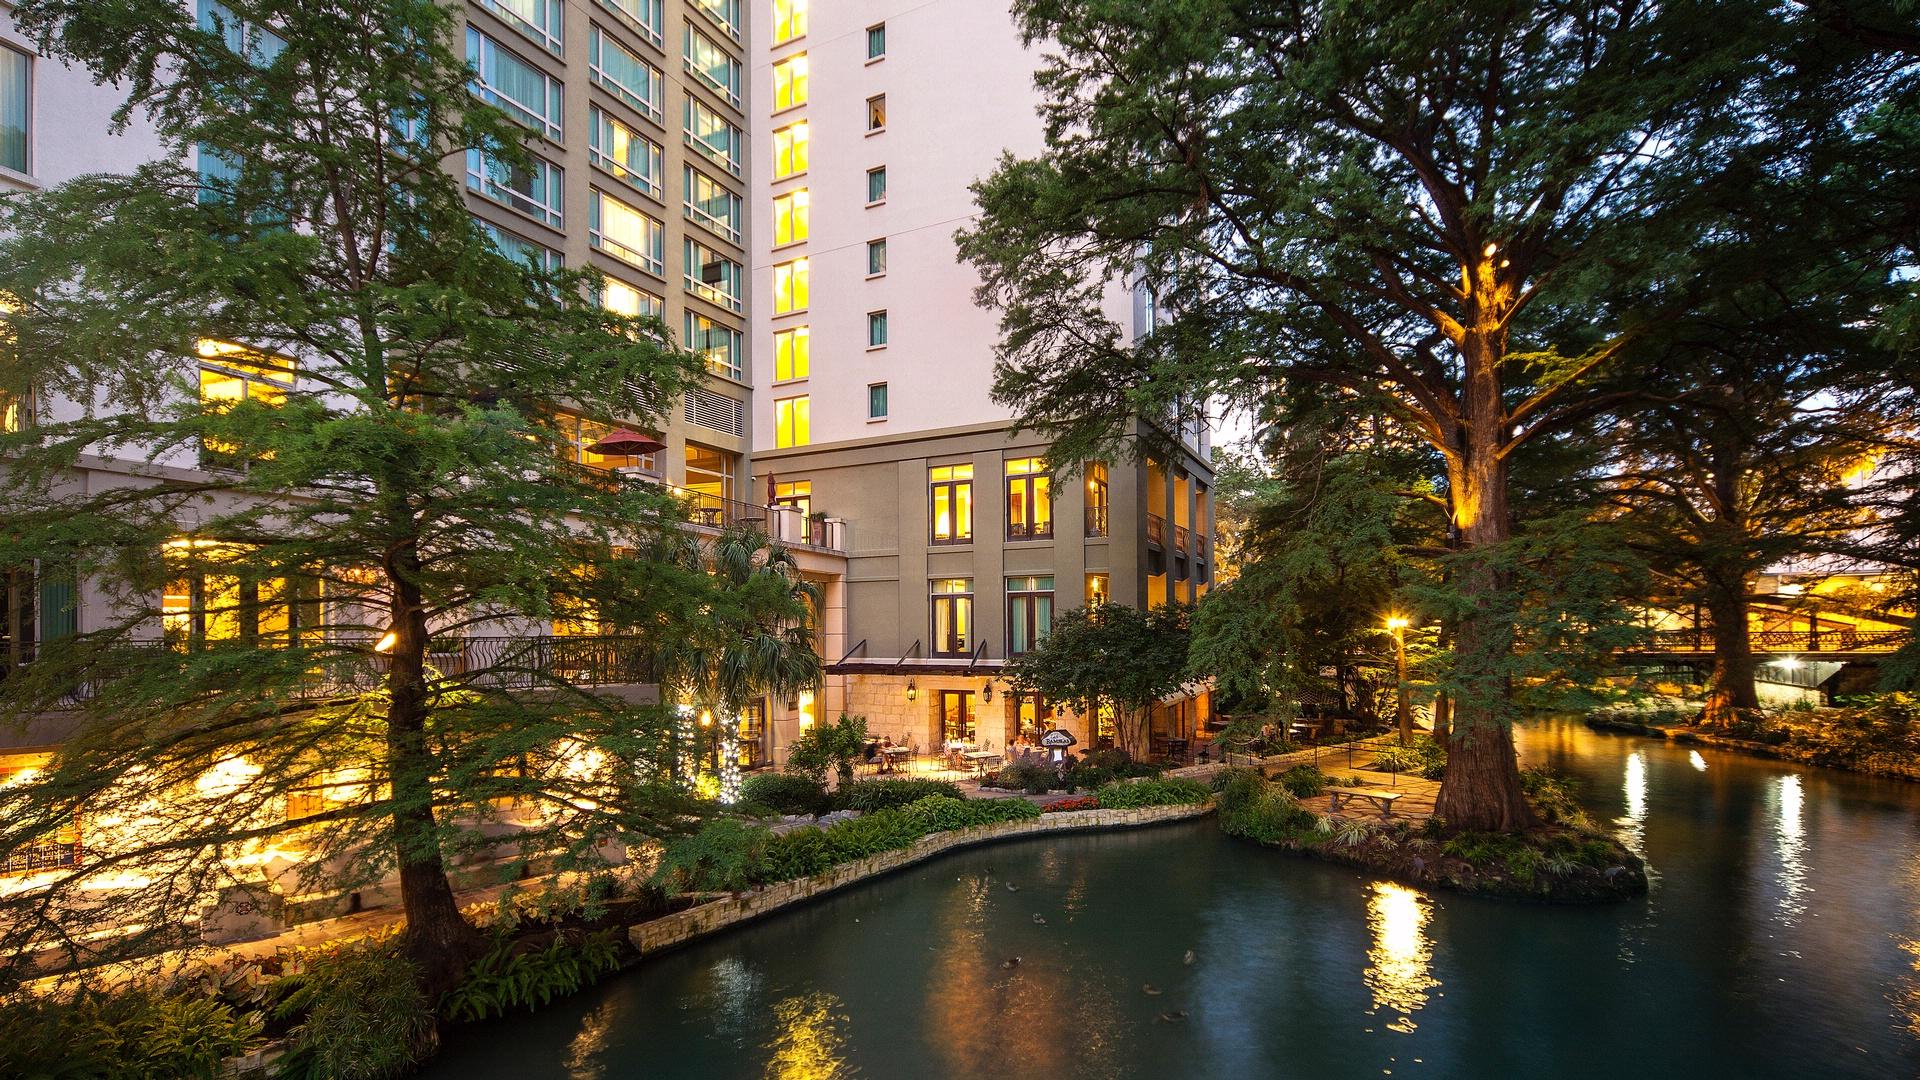 about hotel contessa in san antonio tx benchmark resorts. Black Bedroom Furniture Sets. Home Design Ideas